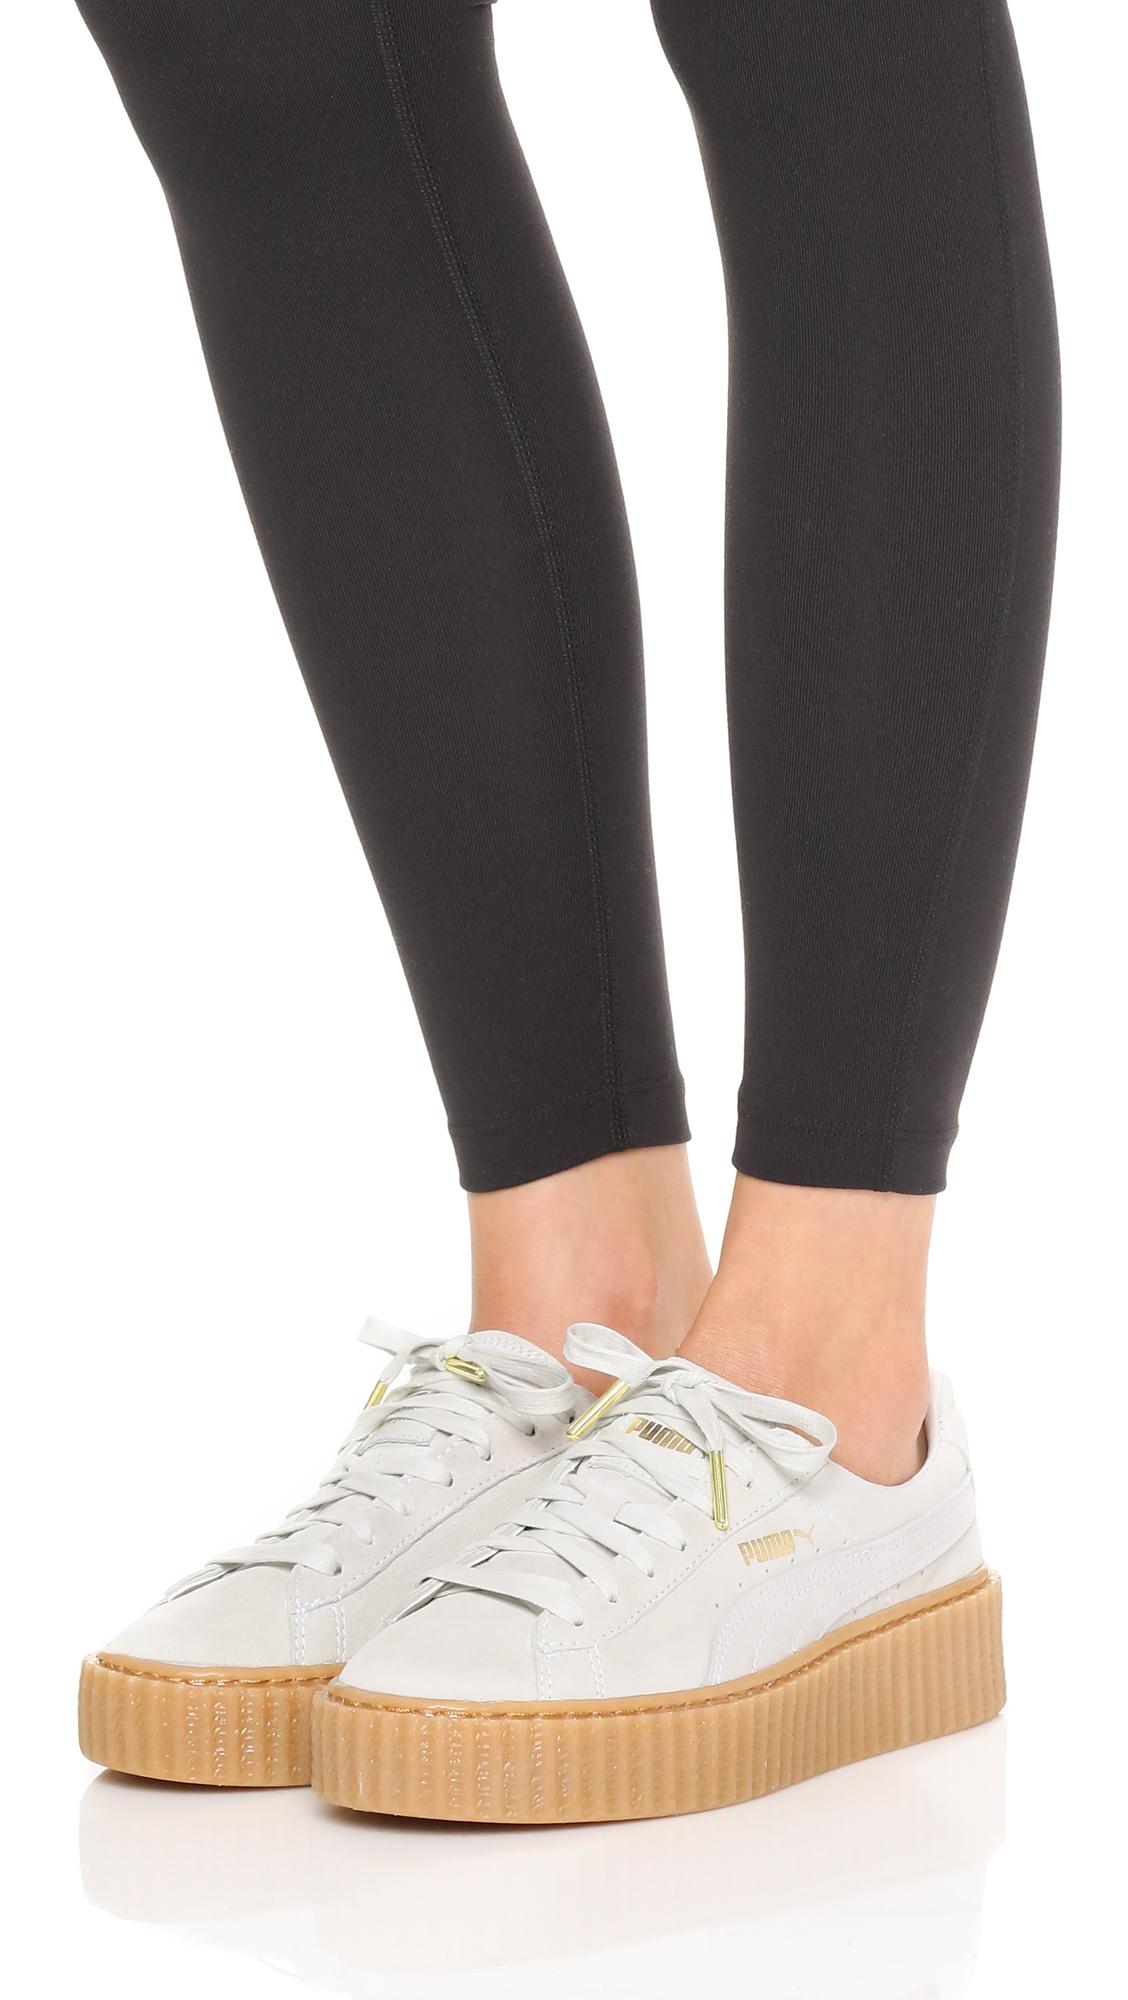 eb3ccd37c34d Lyst - PUMA X Rihanna Creeper Sneakers - Star White oatmeal in White